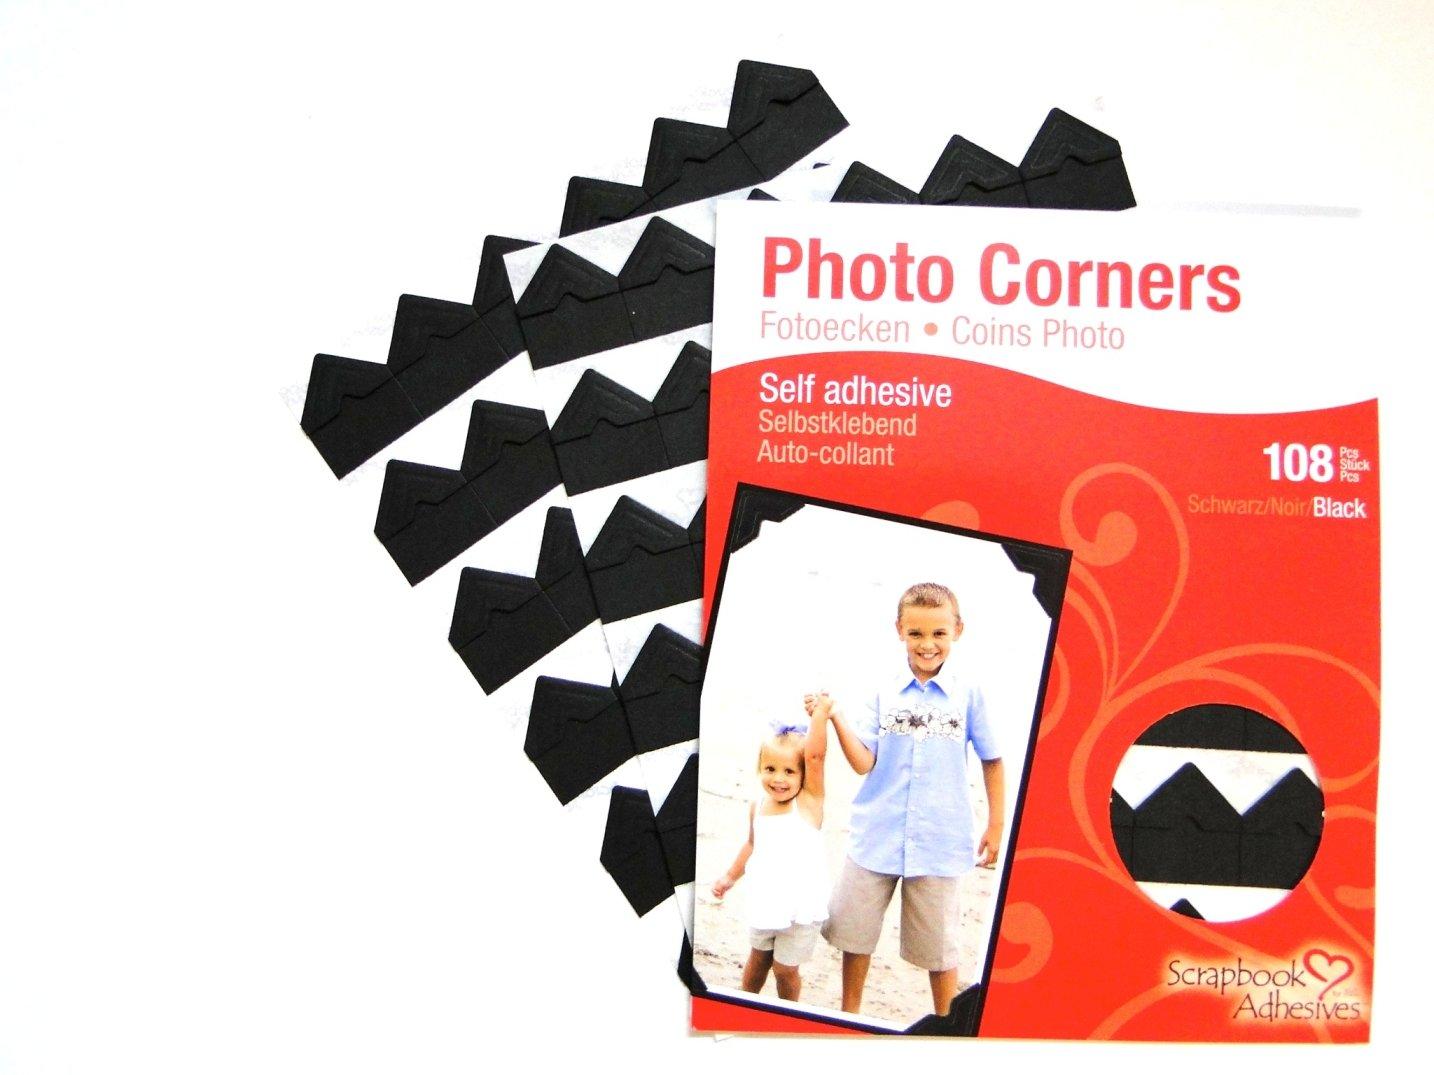 Black Colour Photo Corners Self Adhesive Sticky Acid Free Album Scrapbook Frame (108 Corners) Scrapbook Adhesives